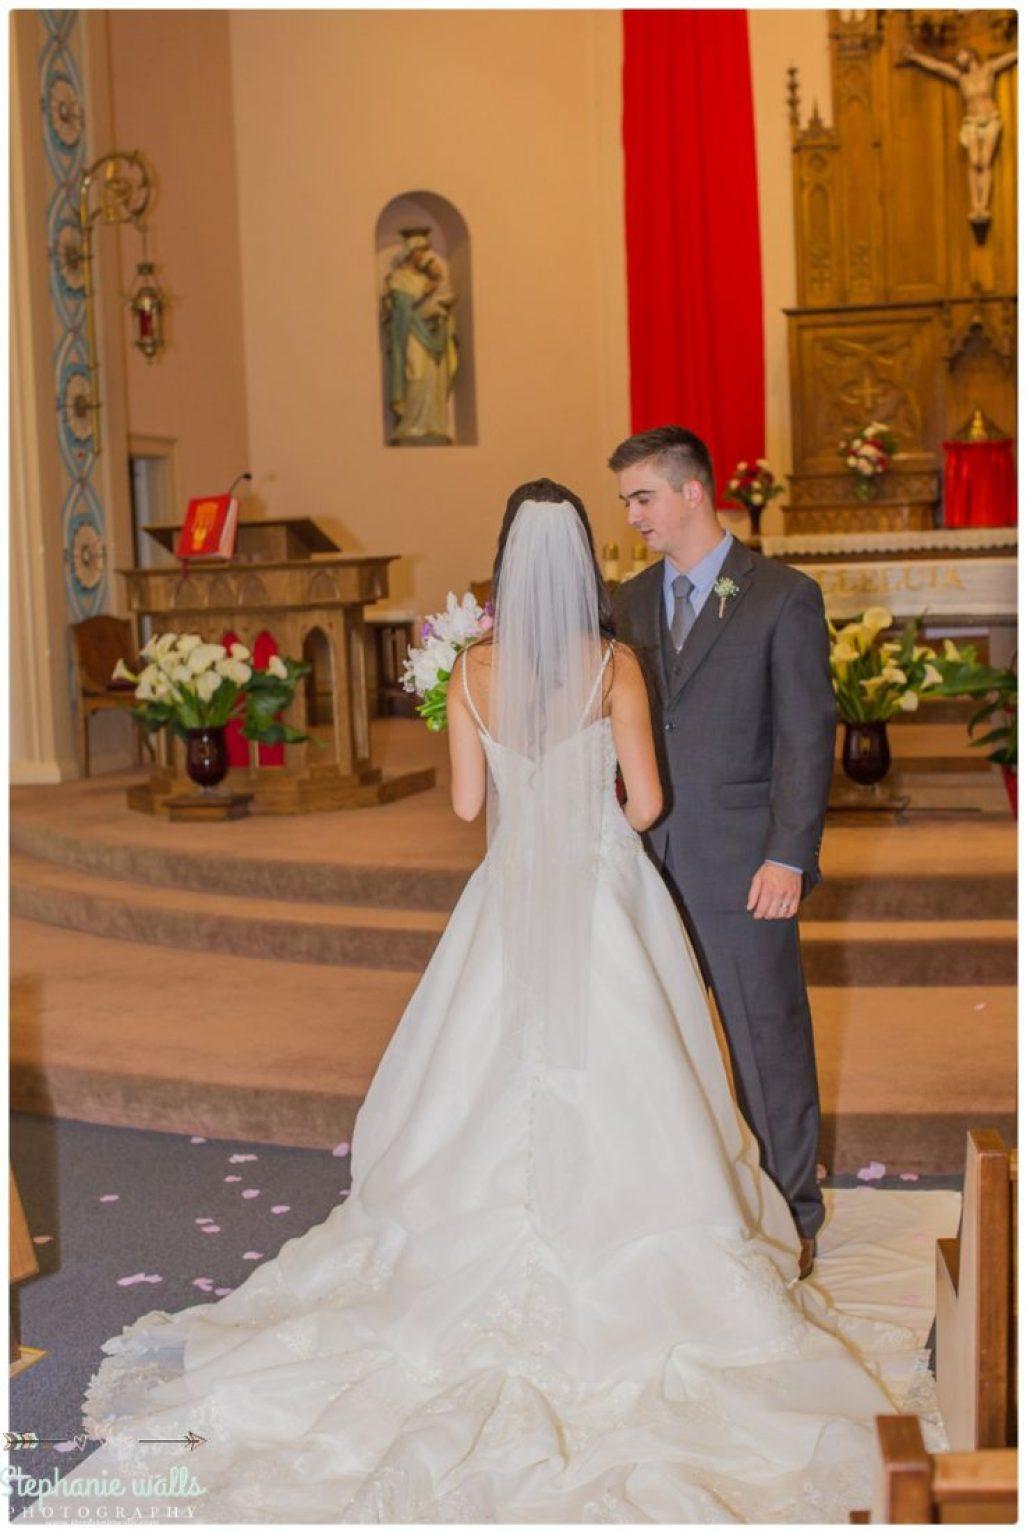 2016 06 19 0015 Cultural Love Wedding | Lady Perpetual Help Everett, Washington